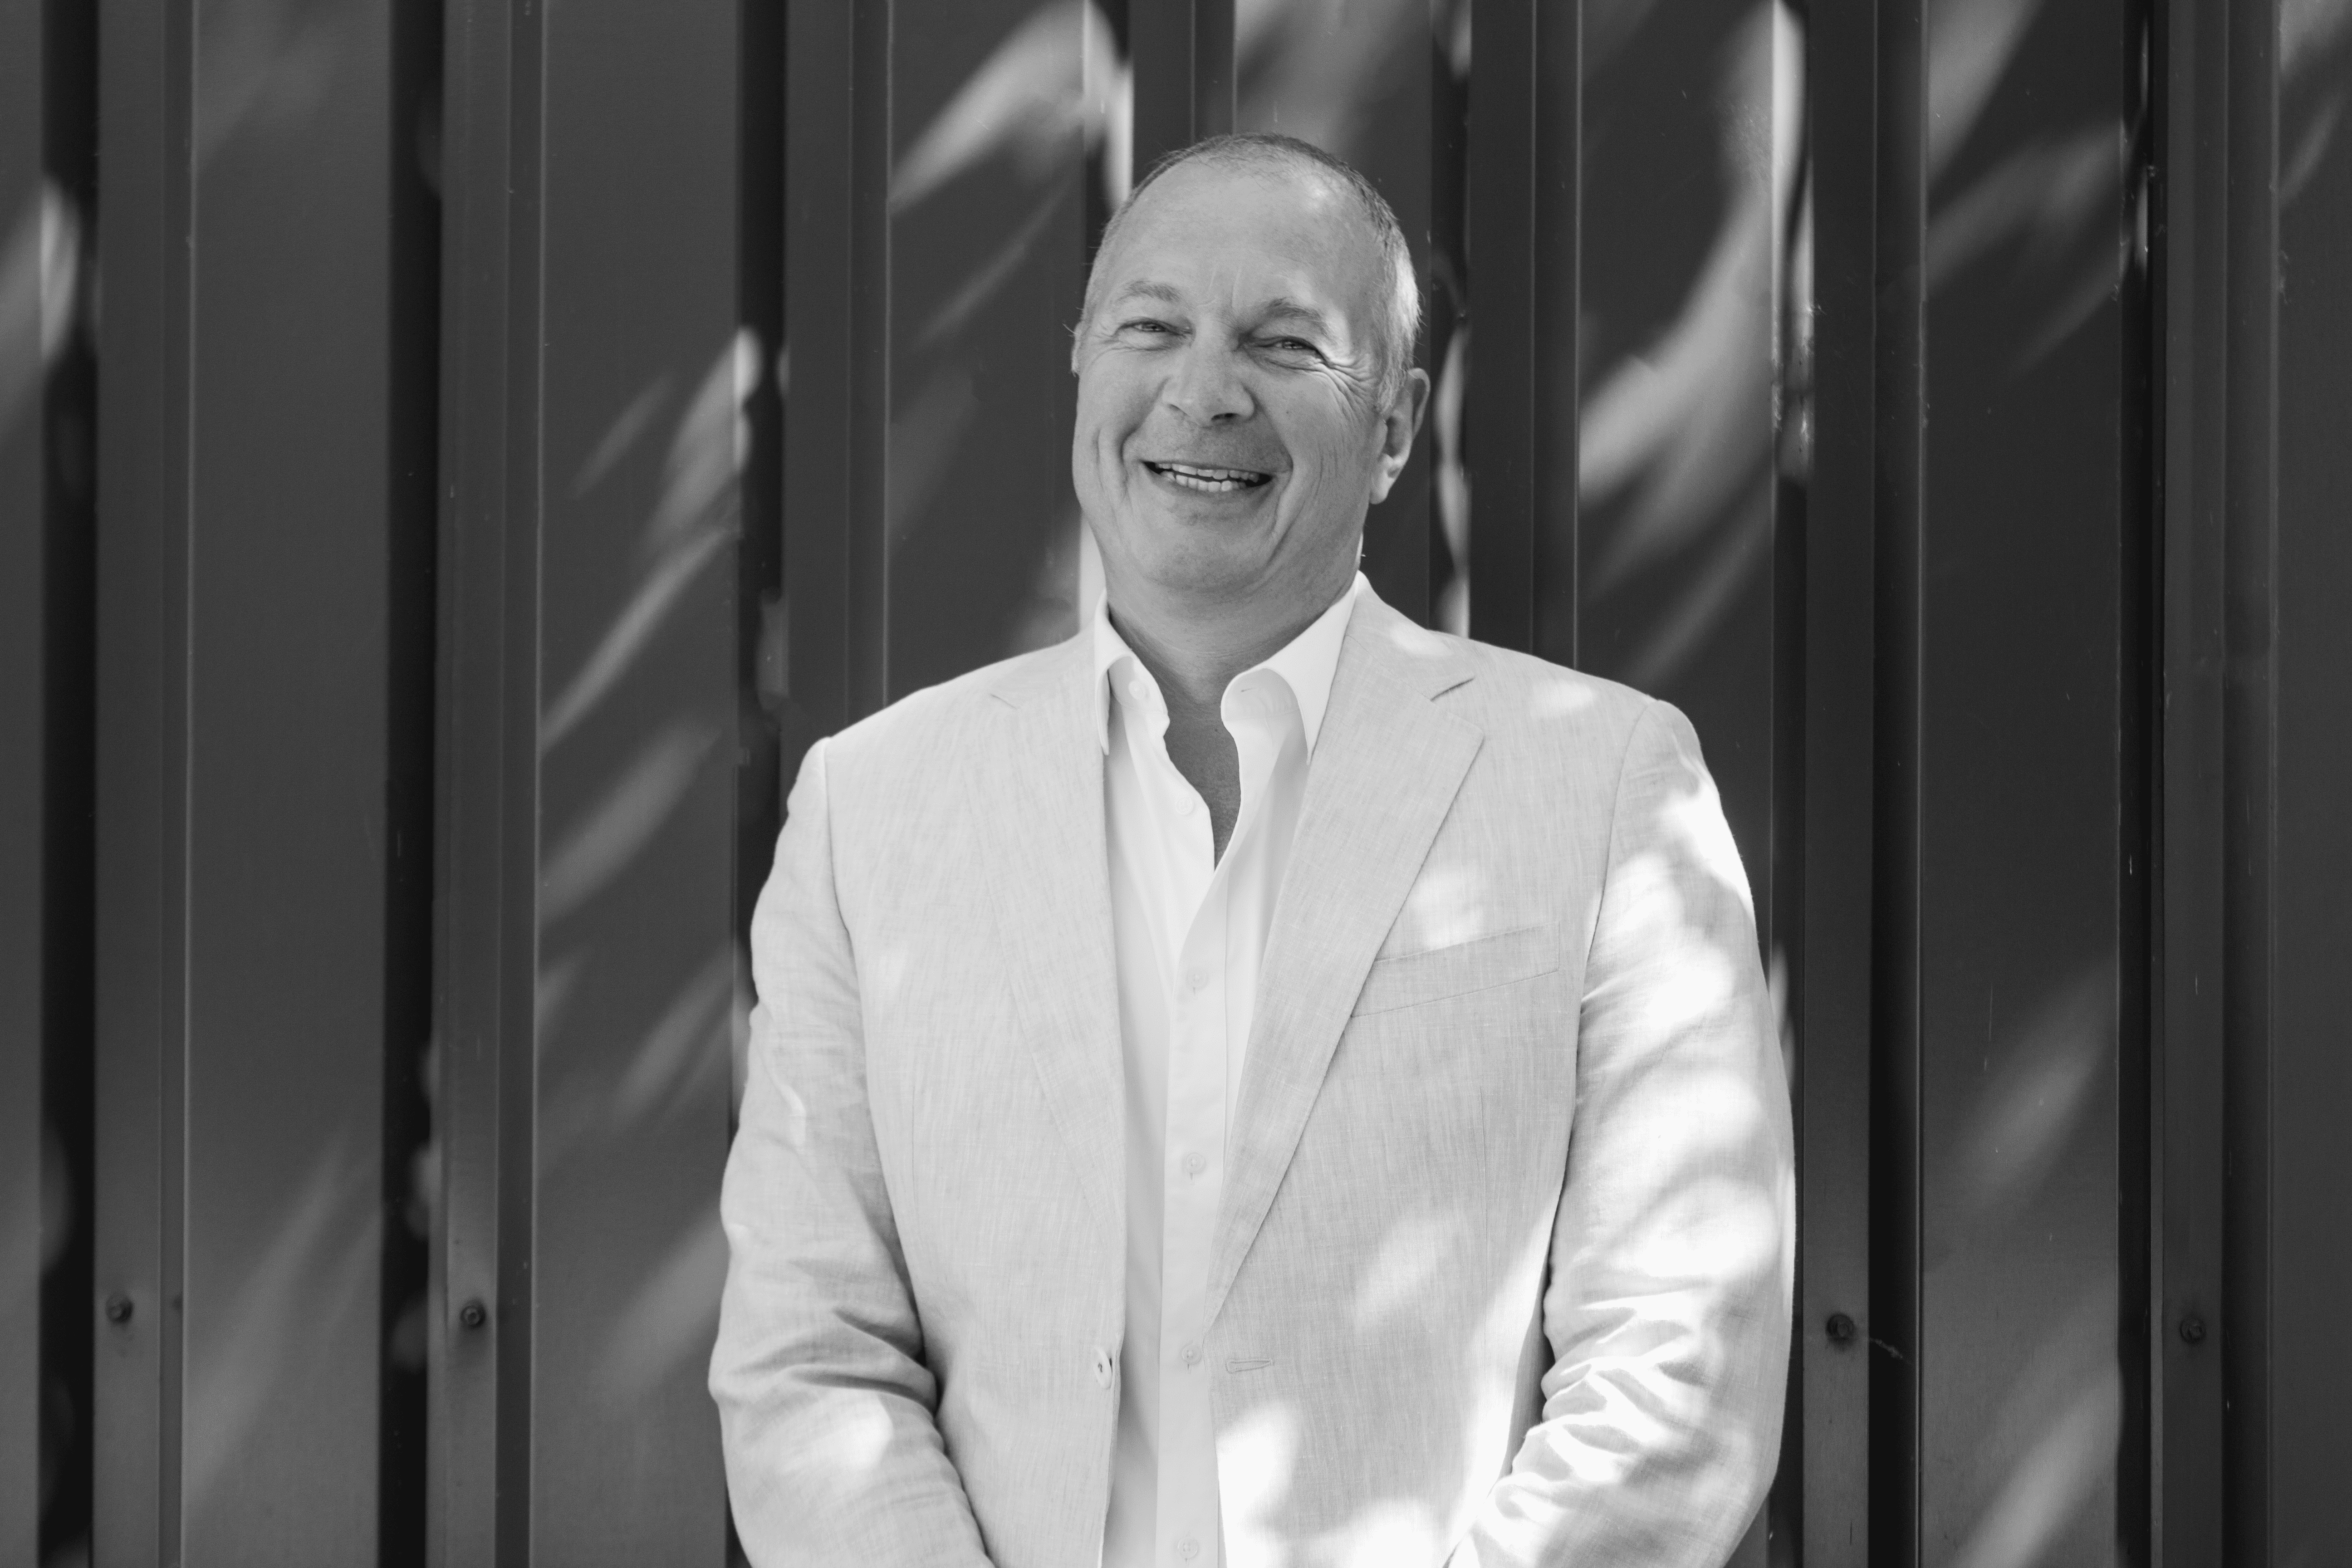 Peter W. Knudsen